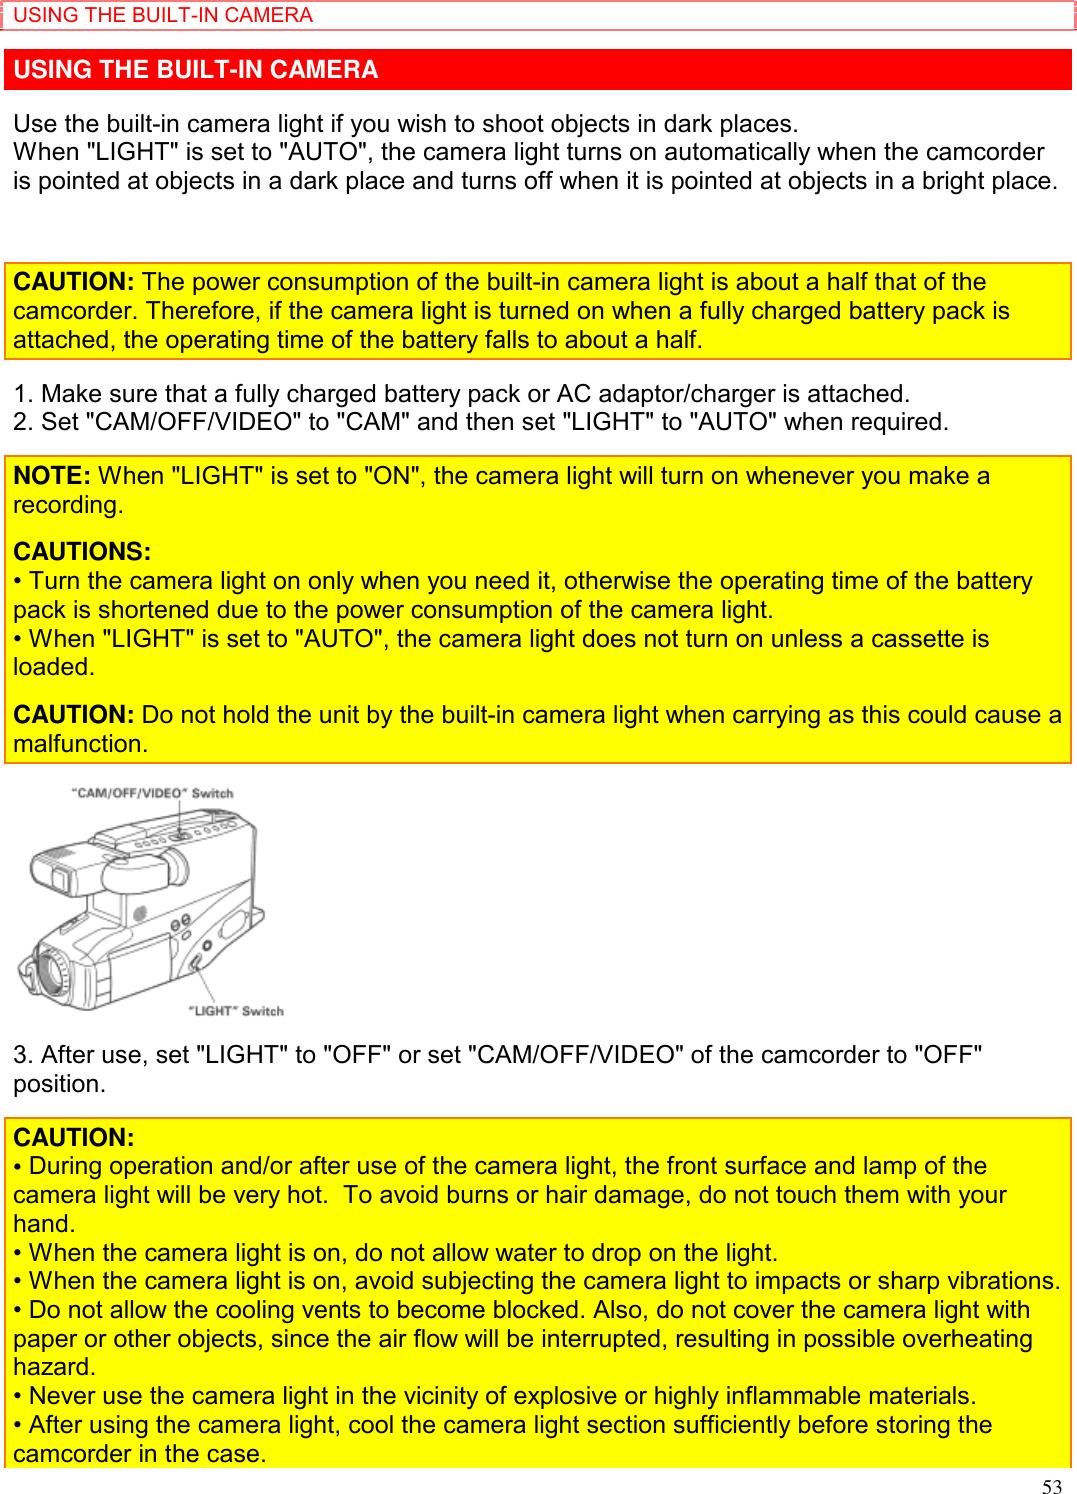 Hitachi Vm 8400La Users Manual 1998 1999 Full Sized Camcorders